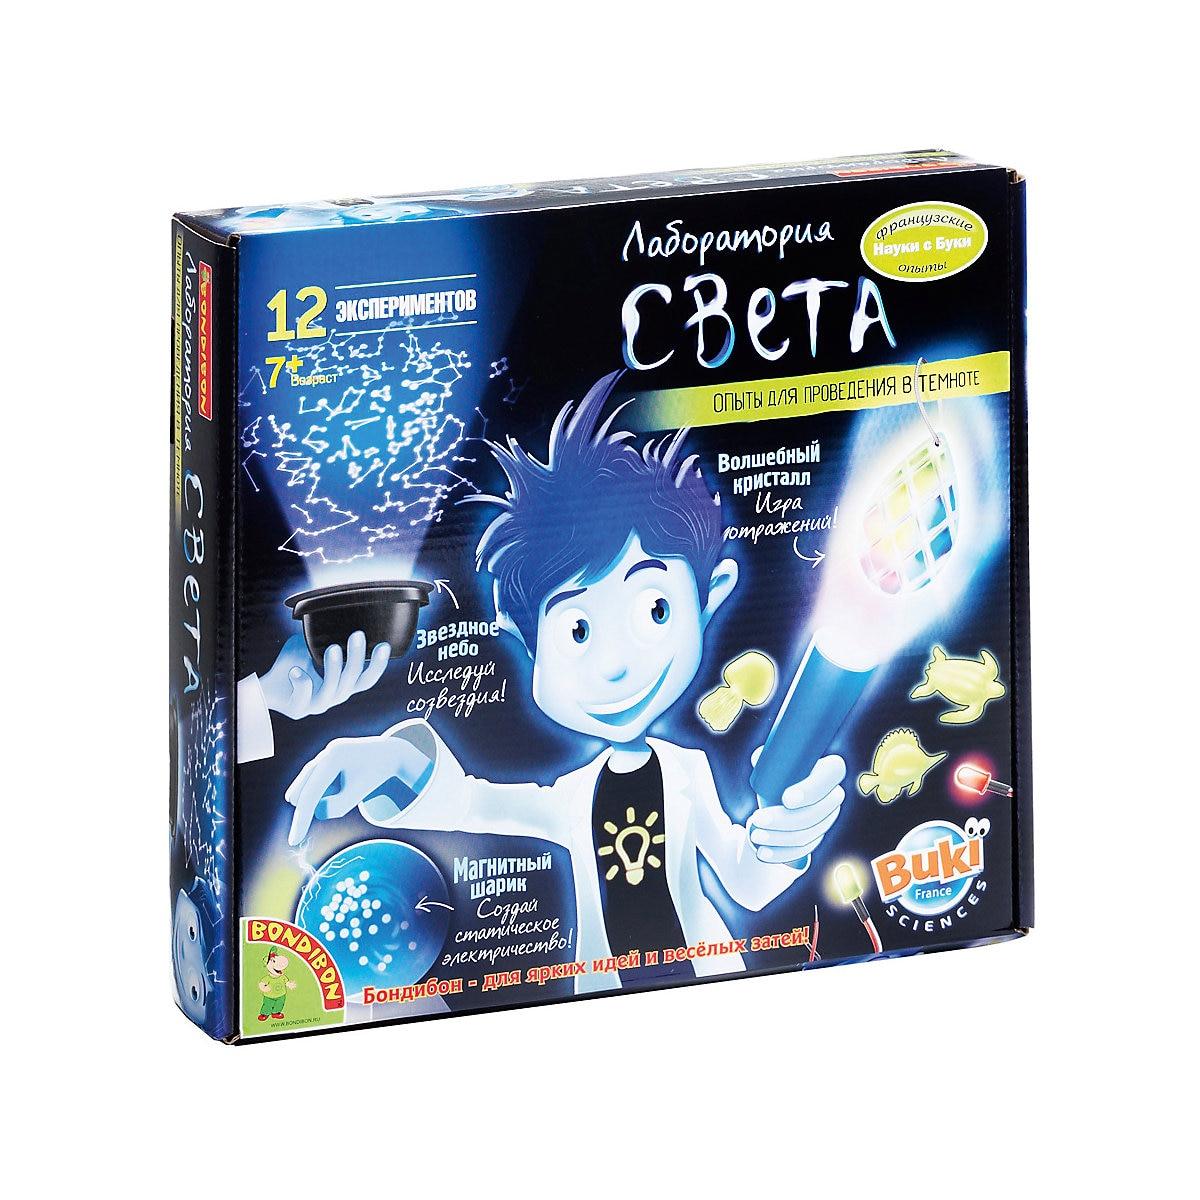 Bondibon Science 4993324 Experiments for children Educational toys Training toy Learning & Education MTpromo цены